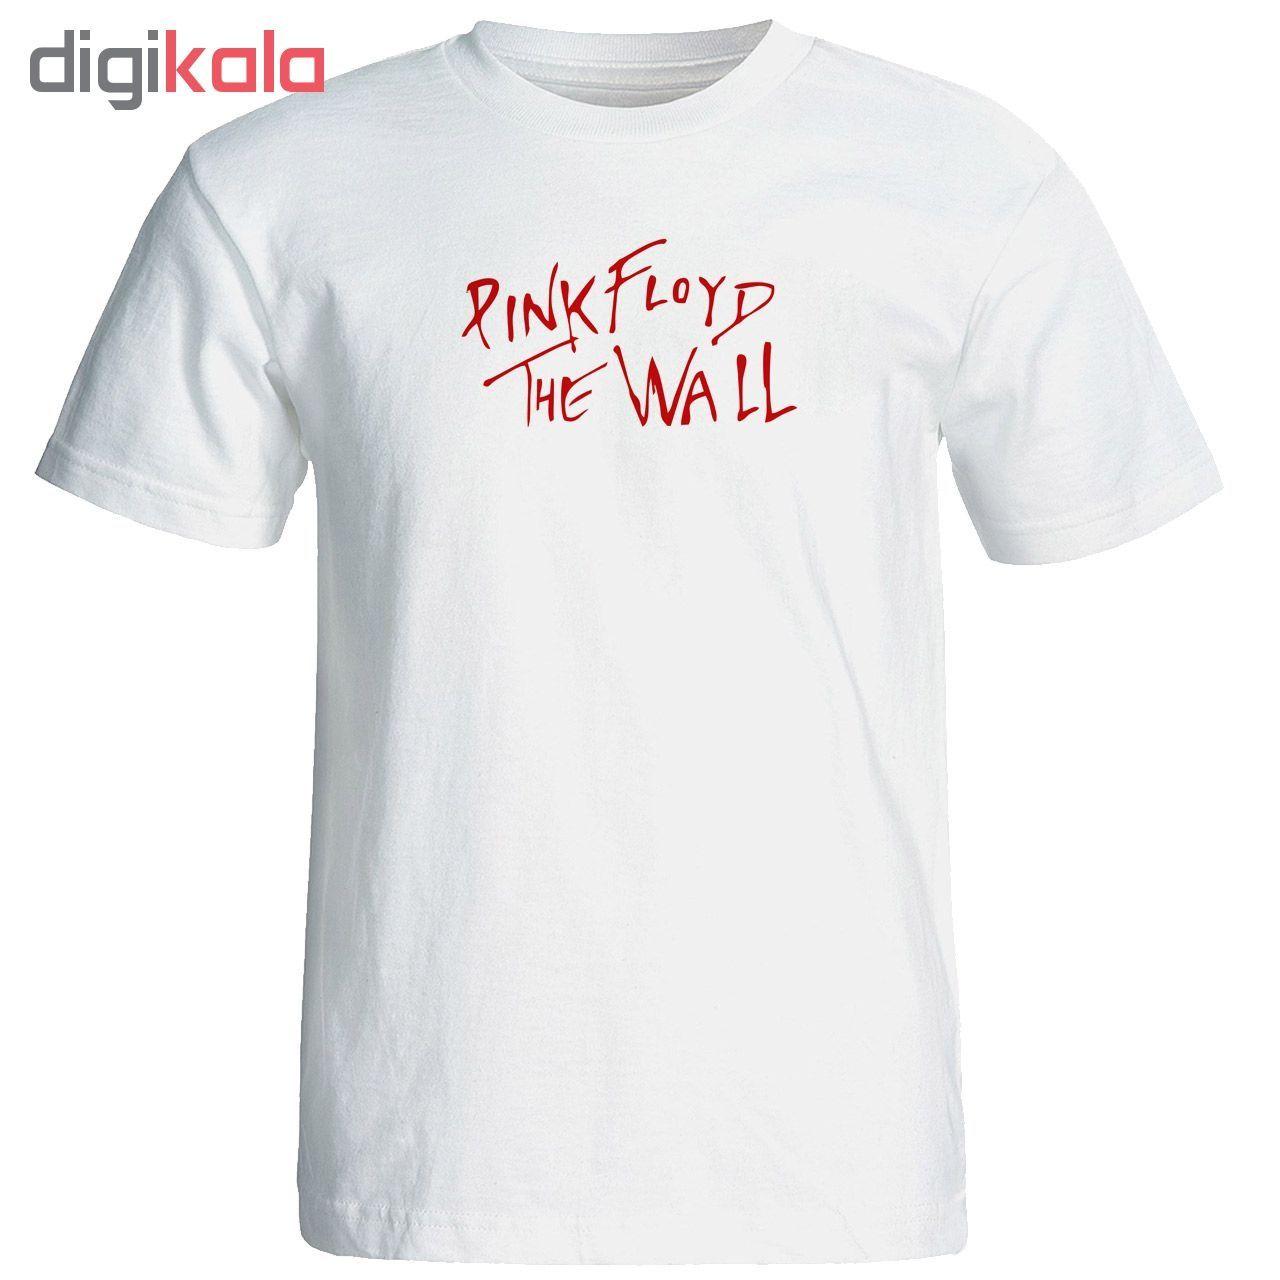 تی شرت  مردانه طرح پینک فلوید کد 12753 main 1 1